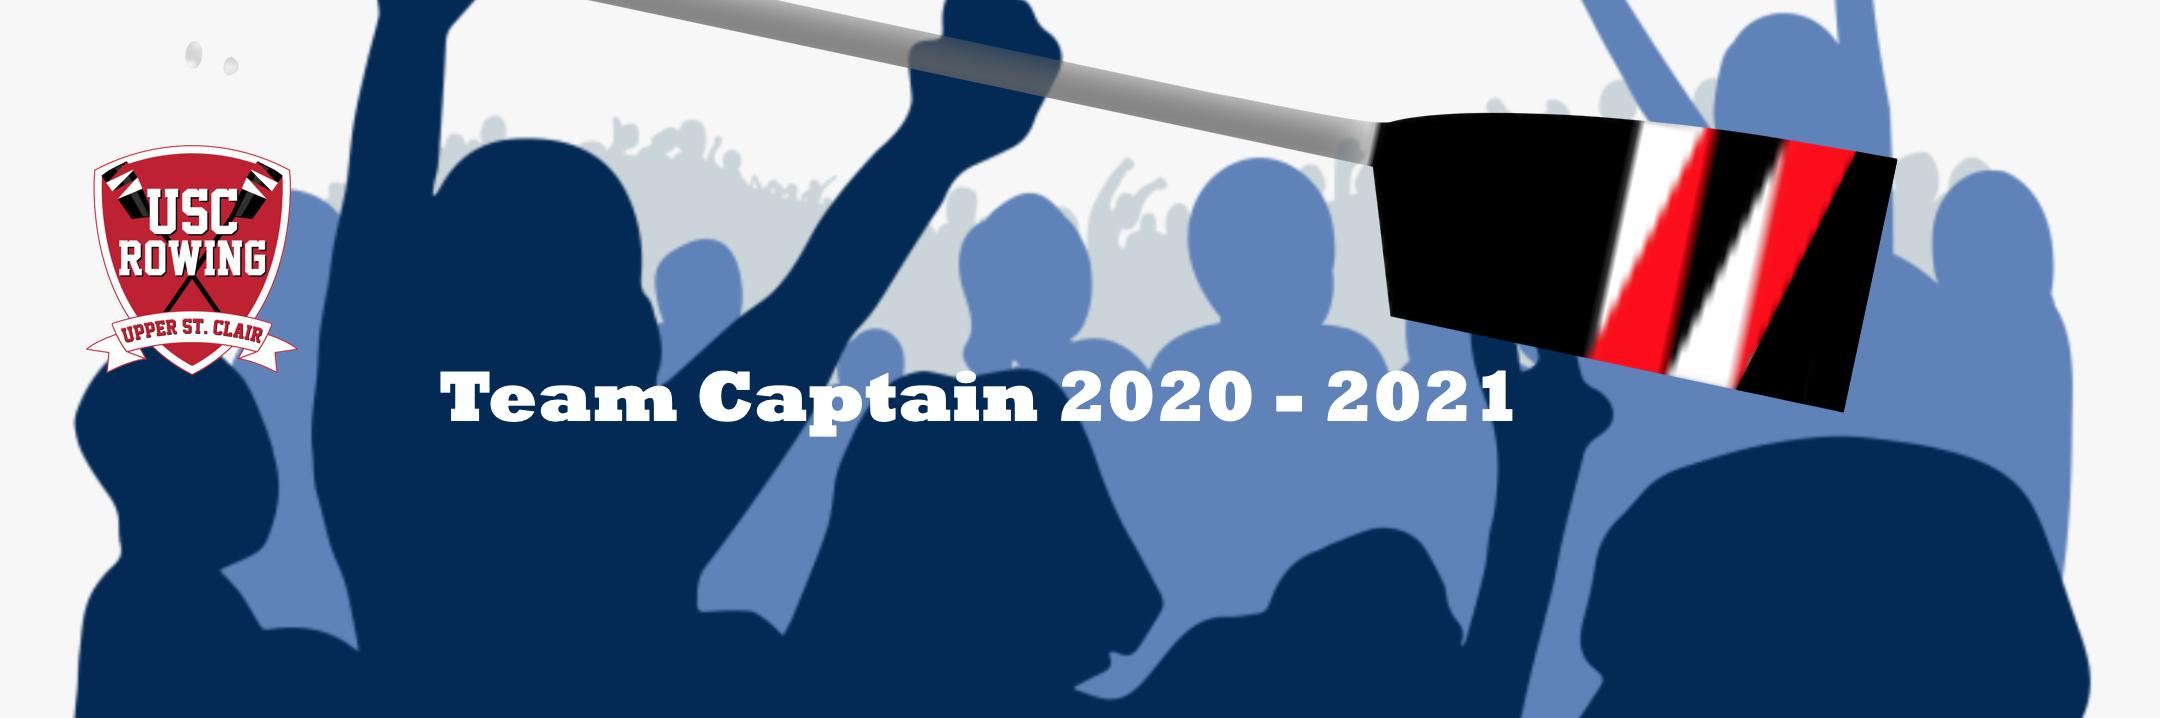 USC Rowing Team Captain election